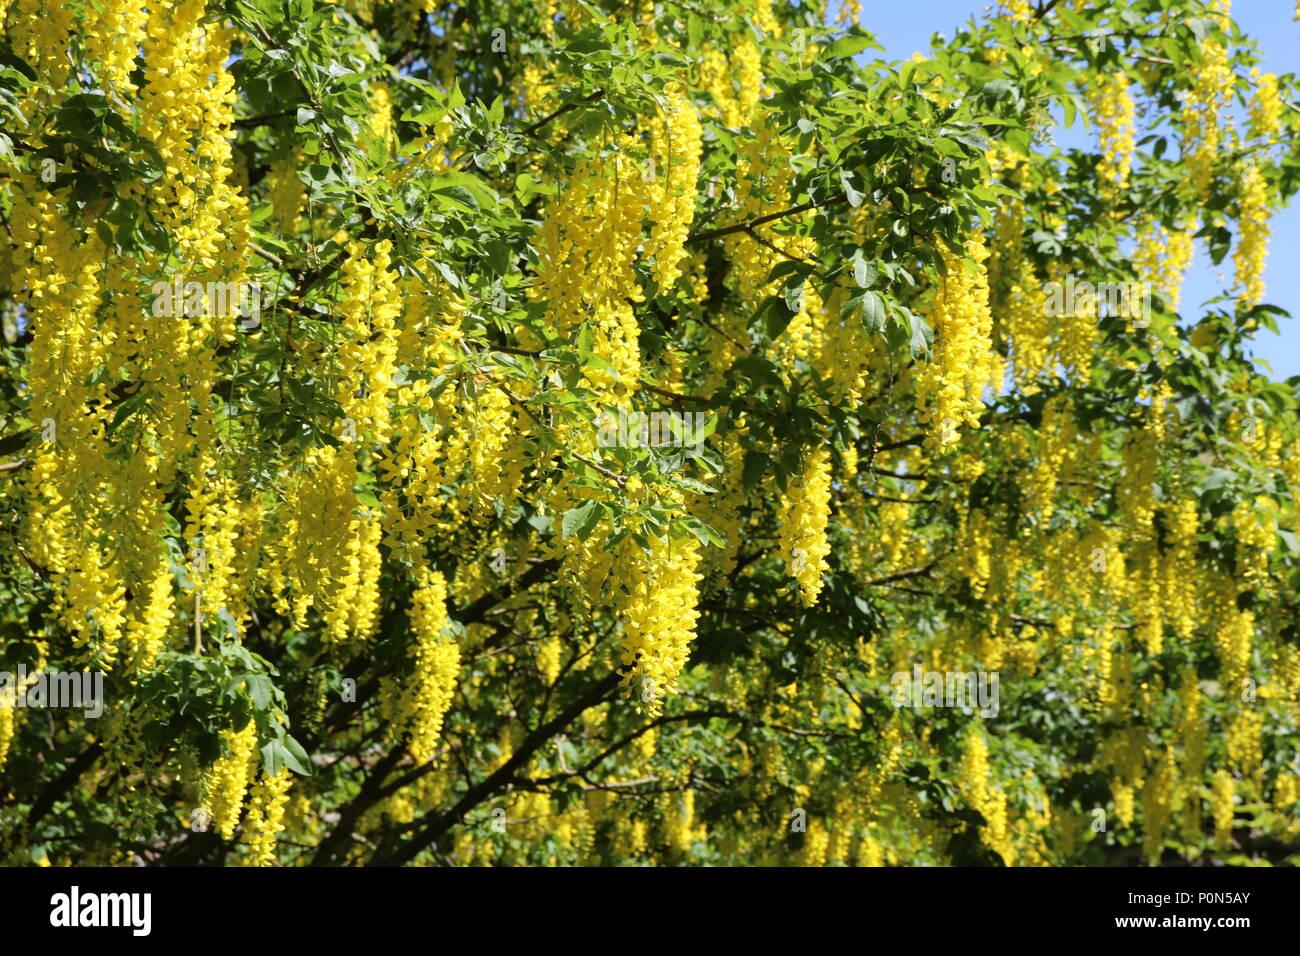 Cluster of yellow hanging flowers stock photos cluster of yellow close up of yellow flowers on laburnum stock image mightylinksfo